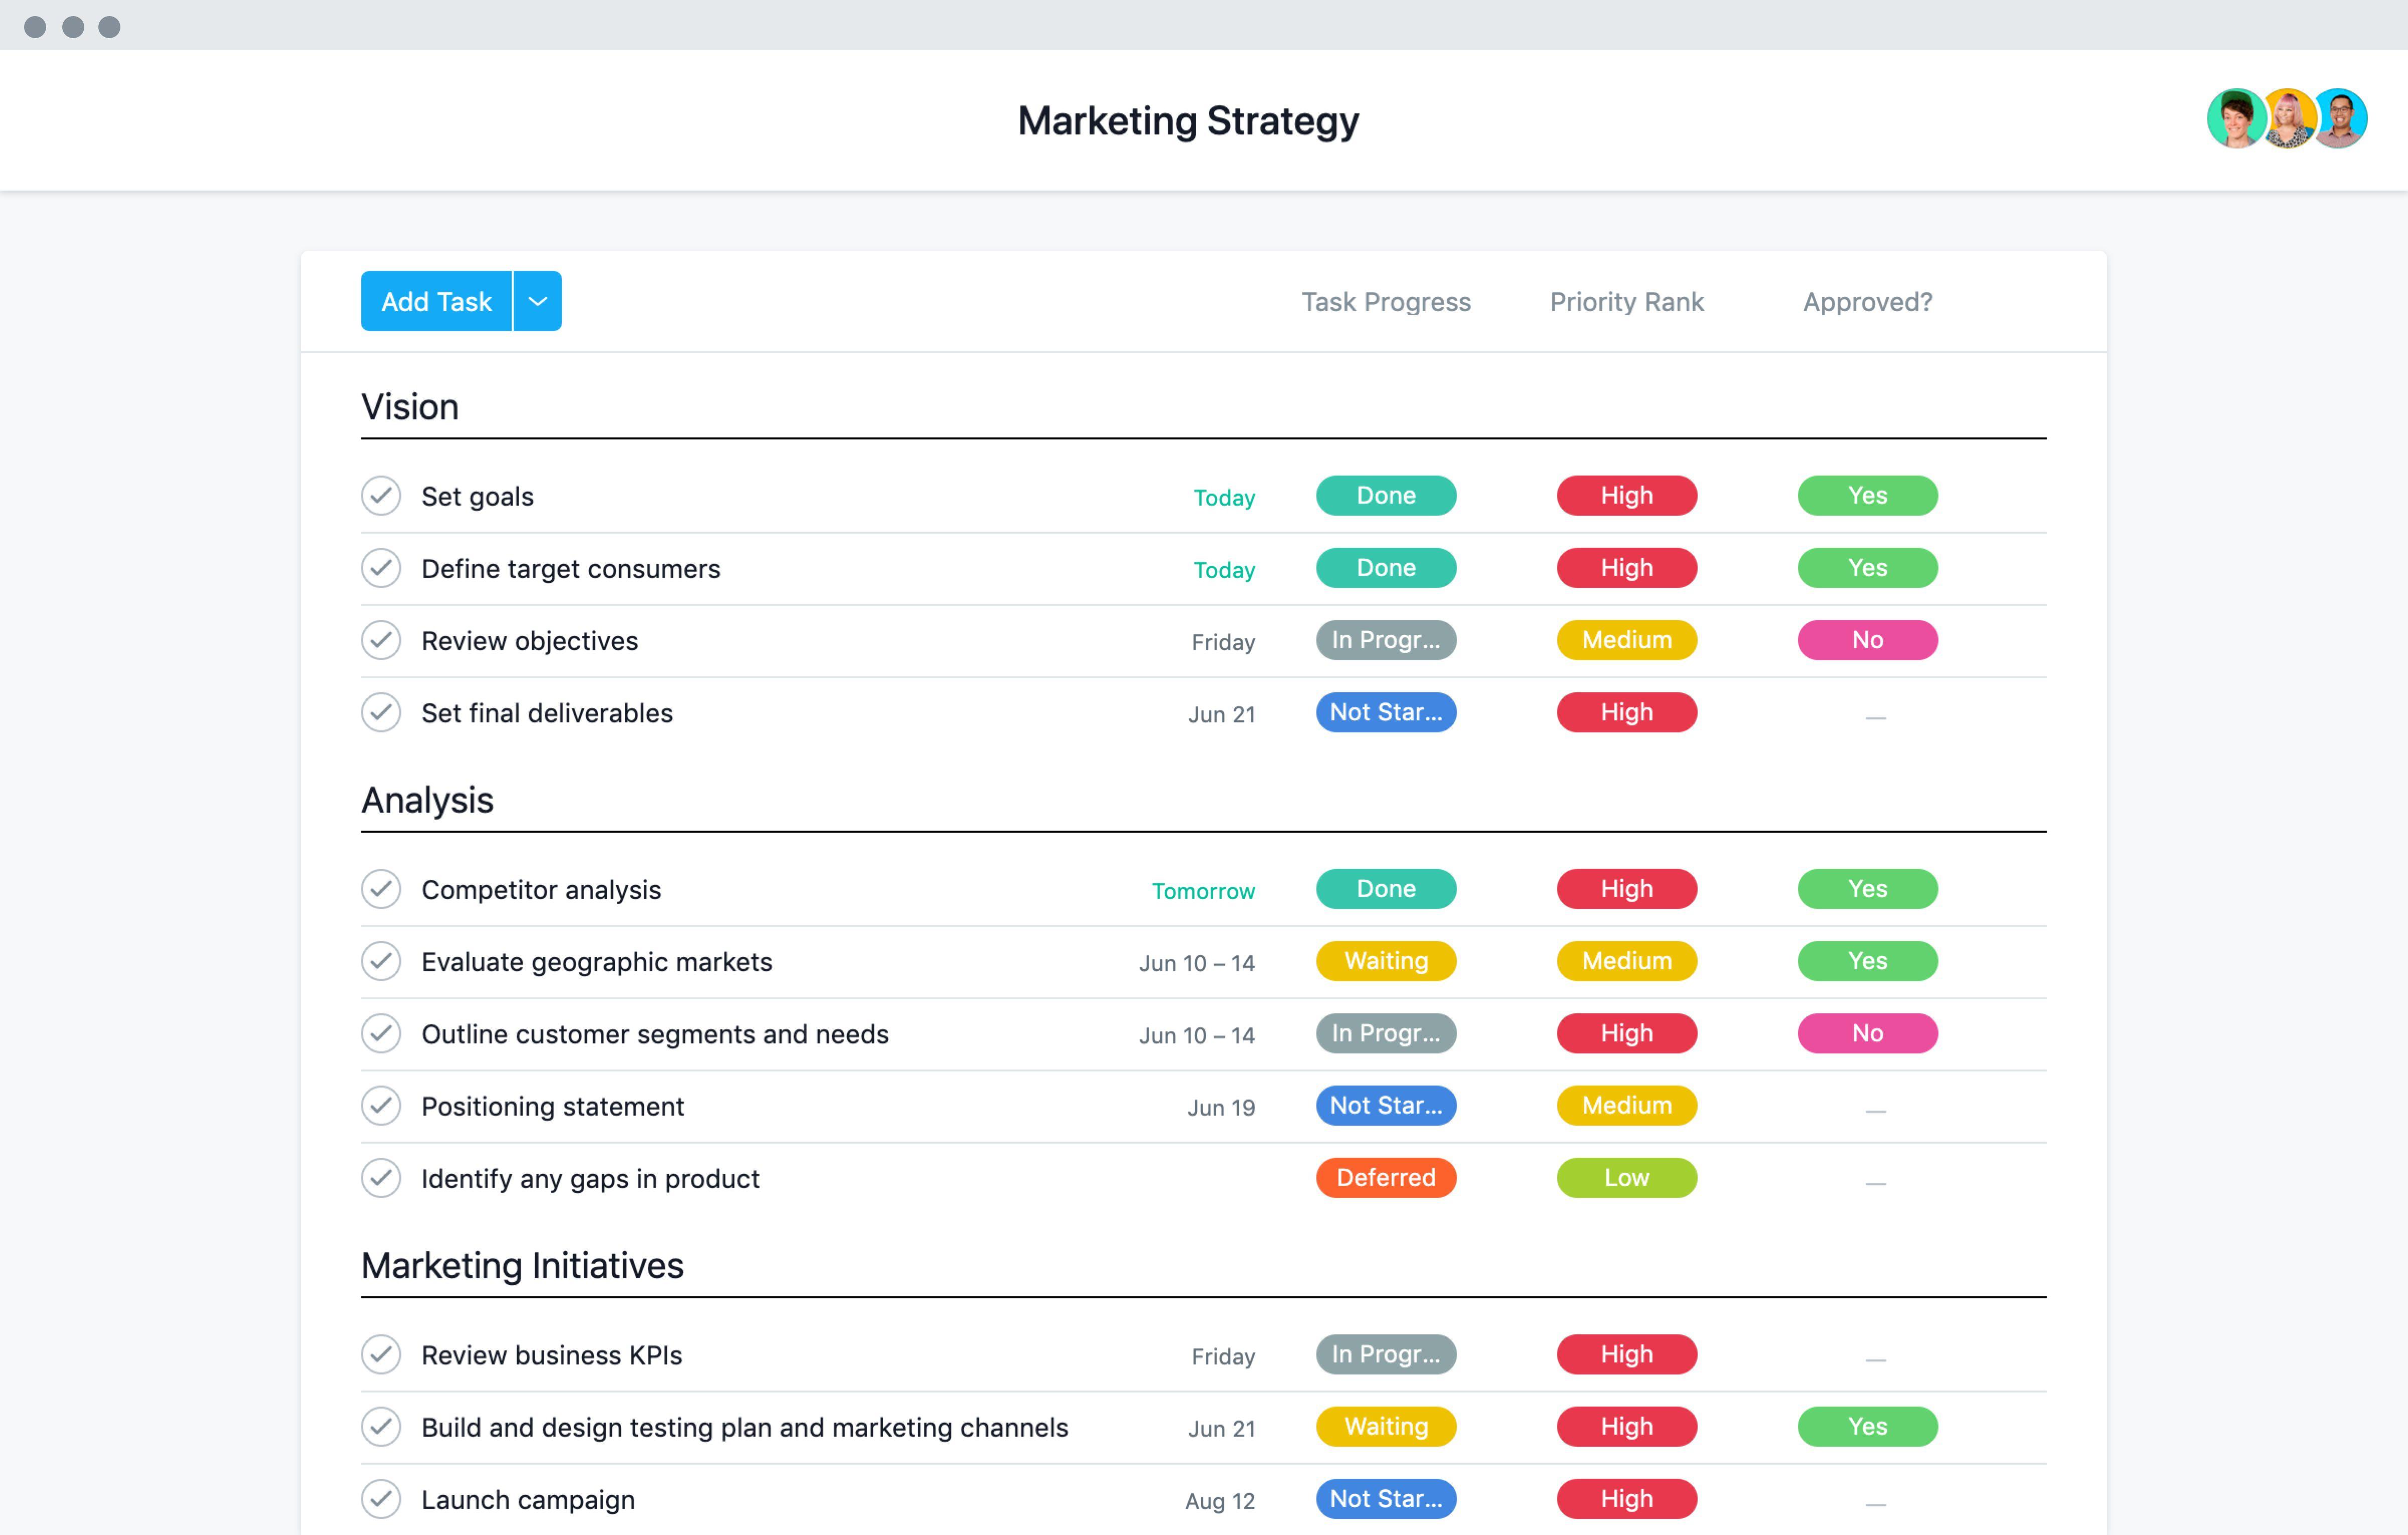 009 Singular Strategic Marketing Plan Template Photo  Templates Example Pdf Word SampleFull